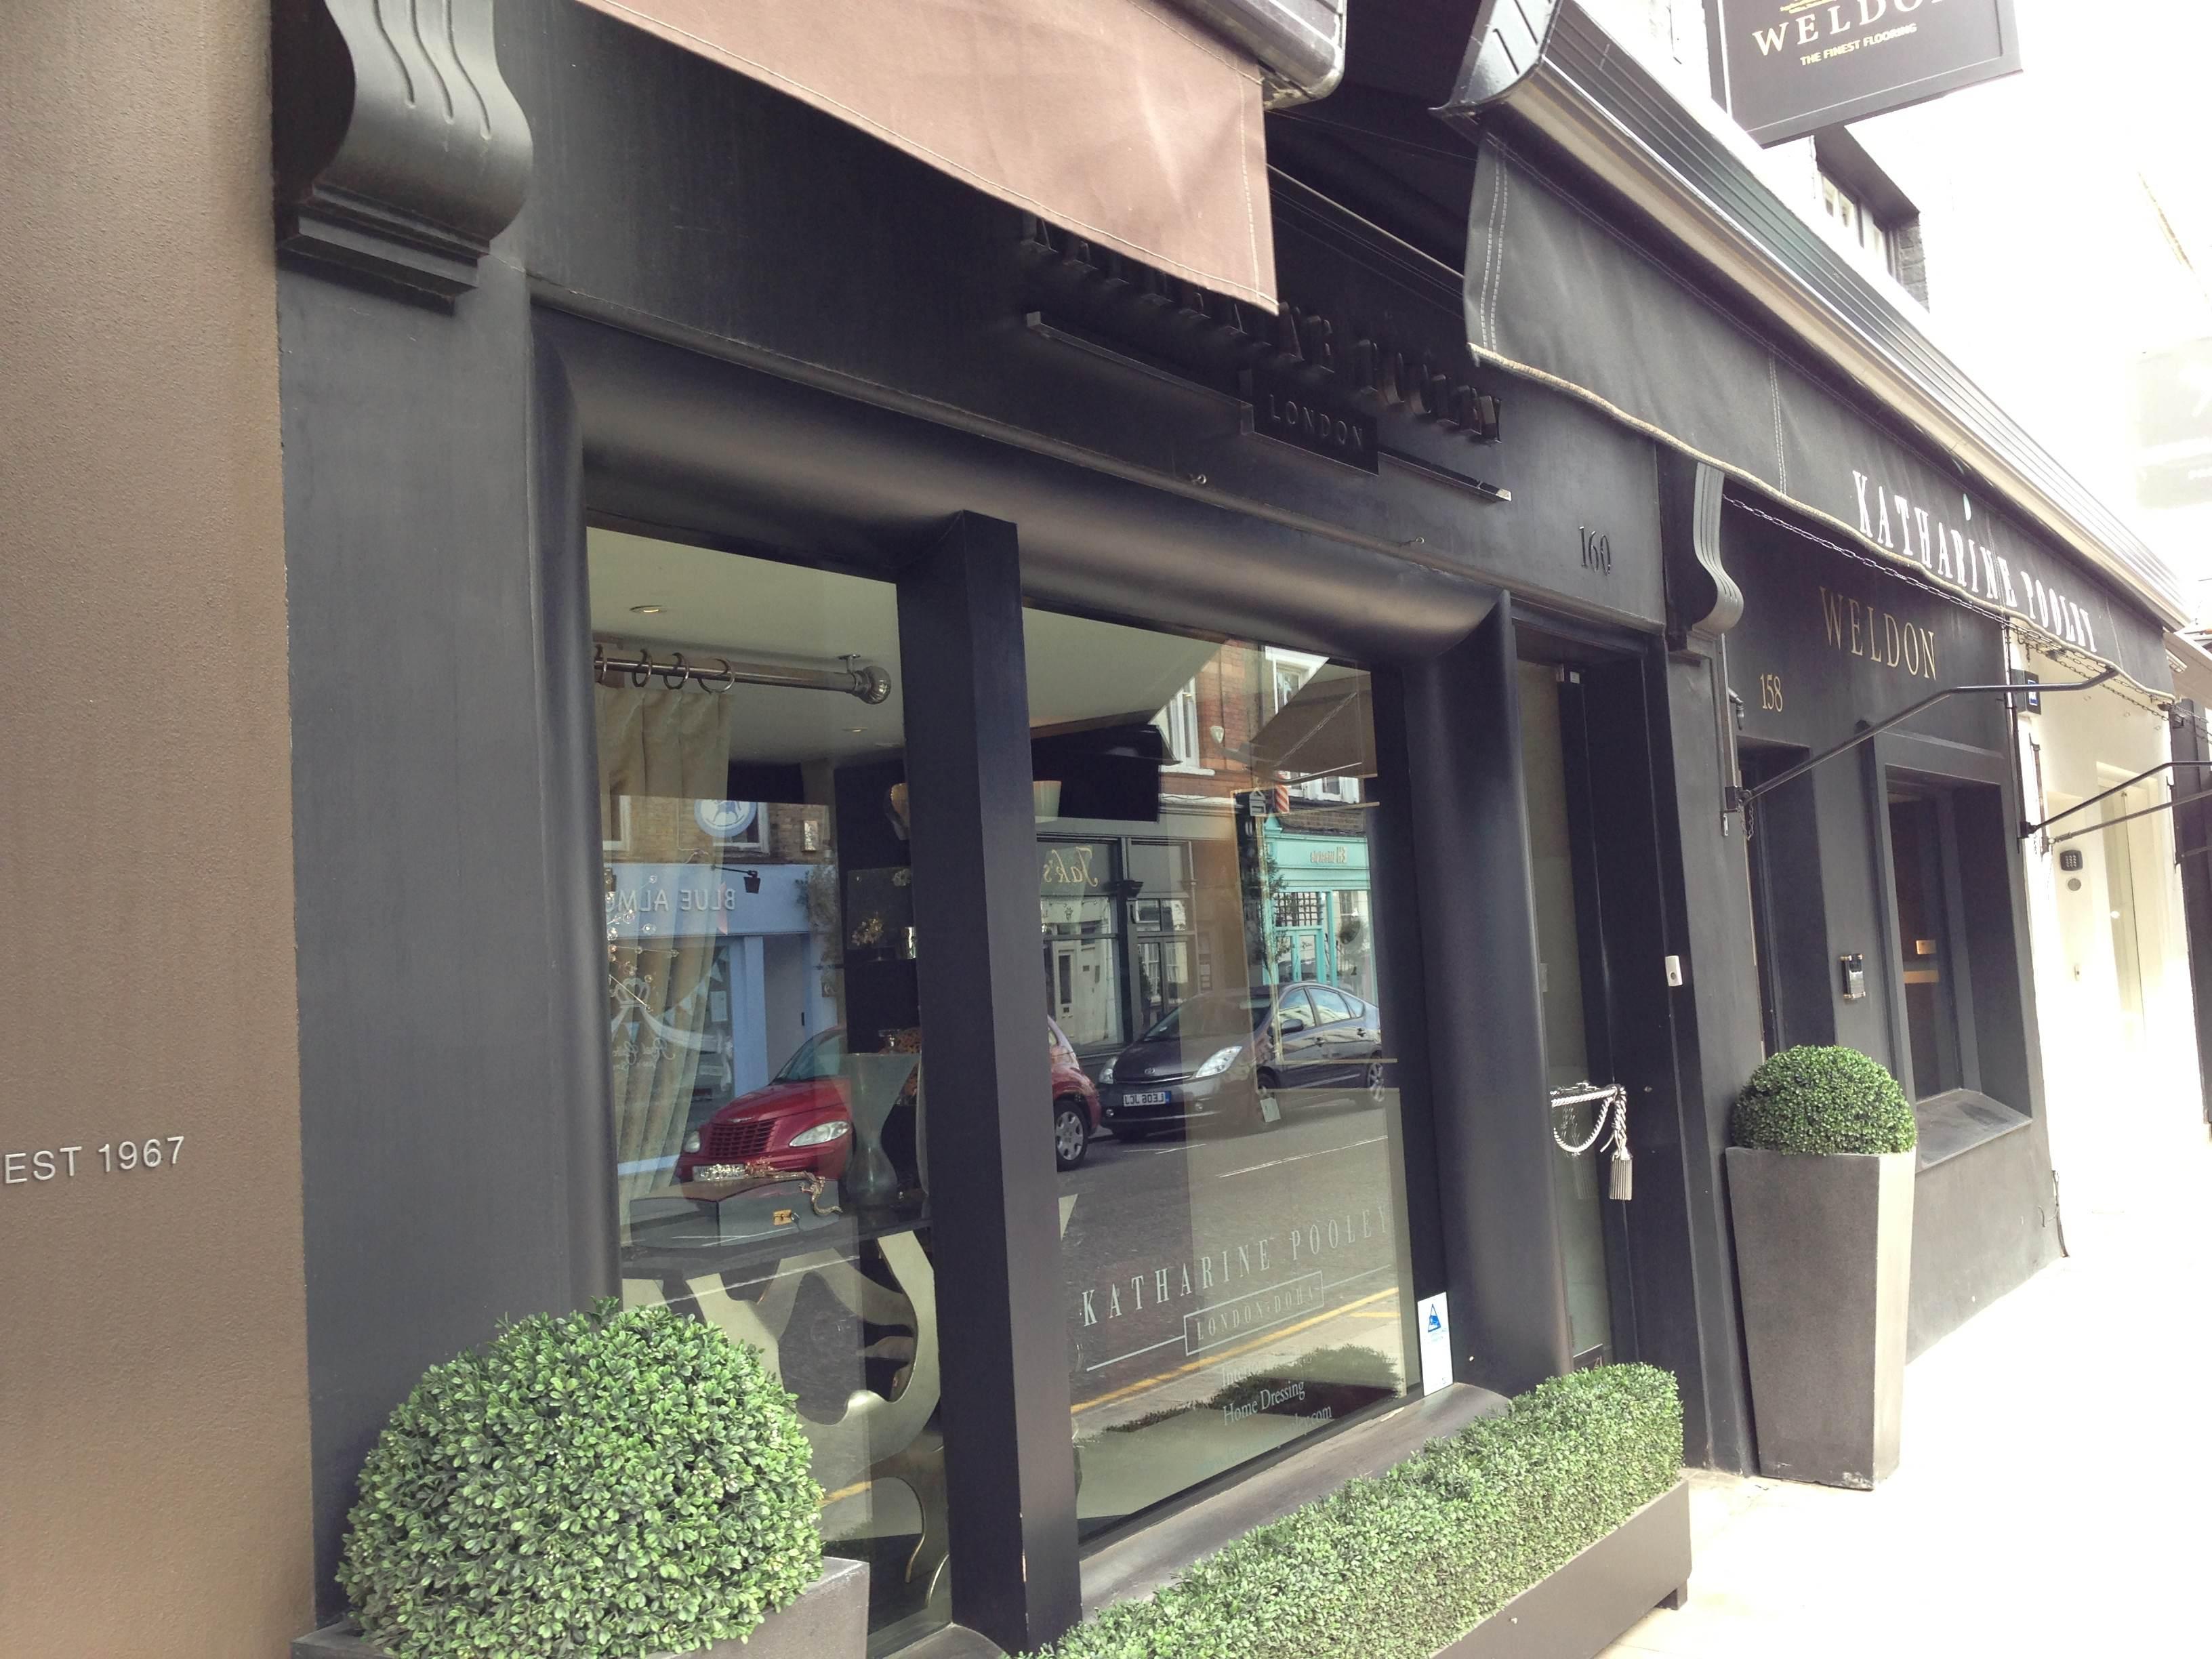 Katharine Pooley showroom London